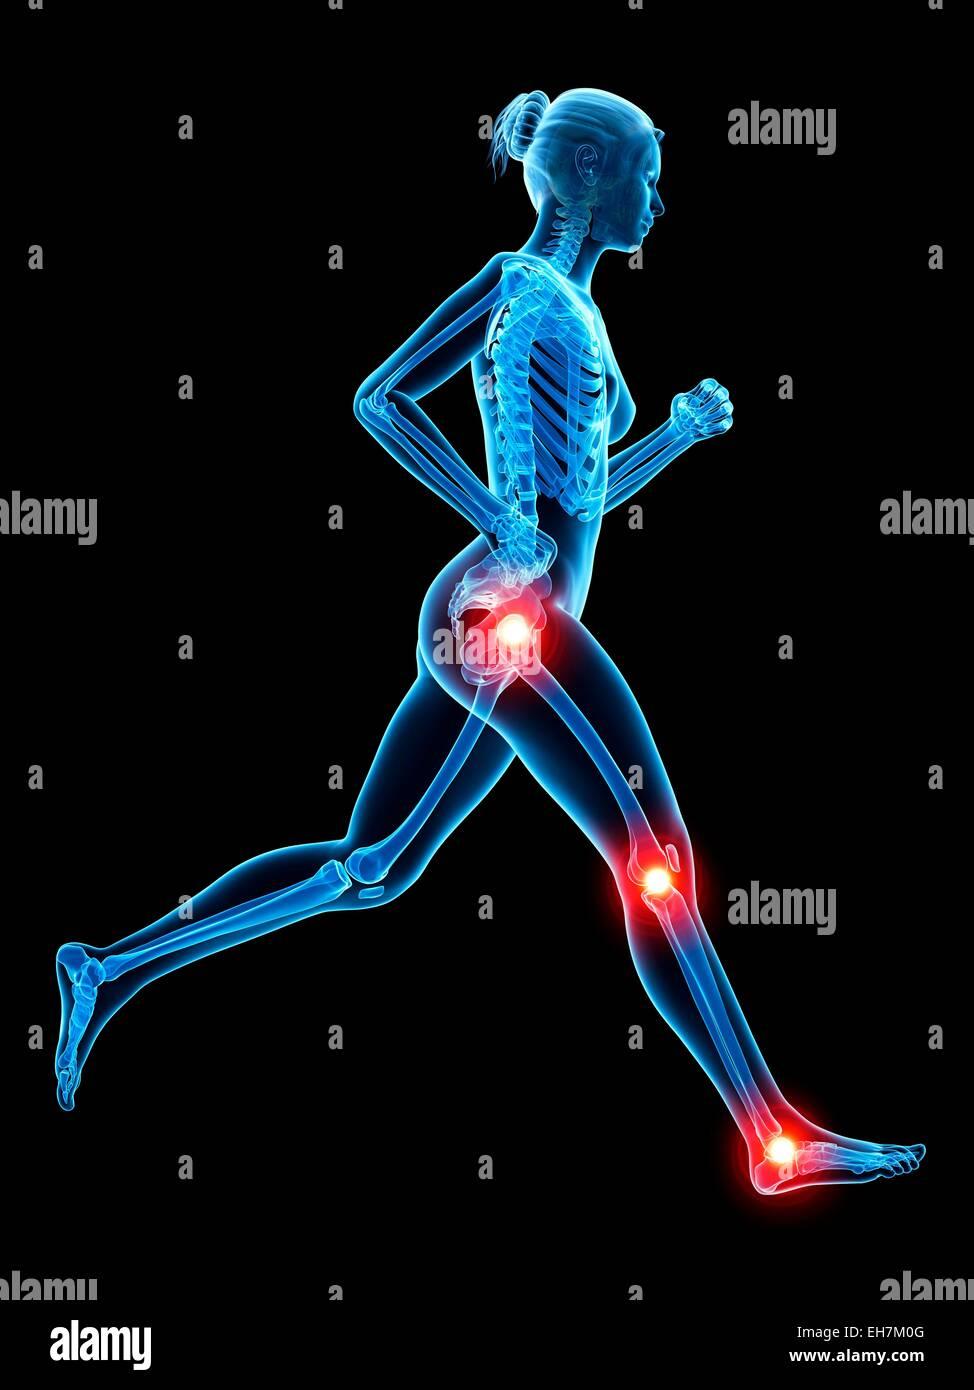 Human Body Joints Illustration Stock Photos Human Body Joints